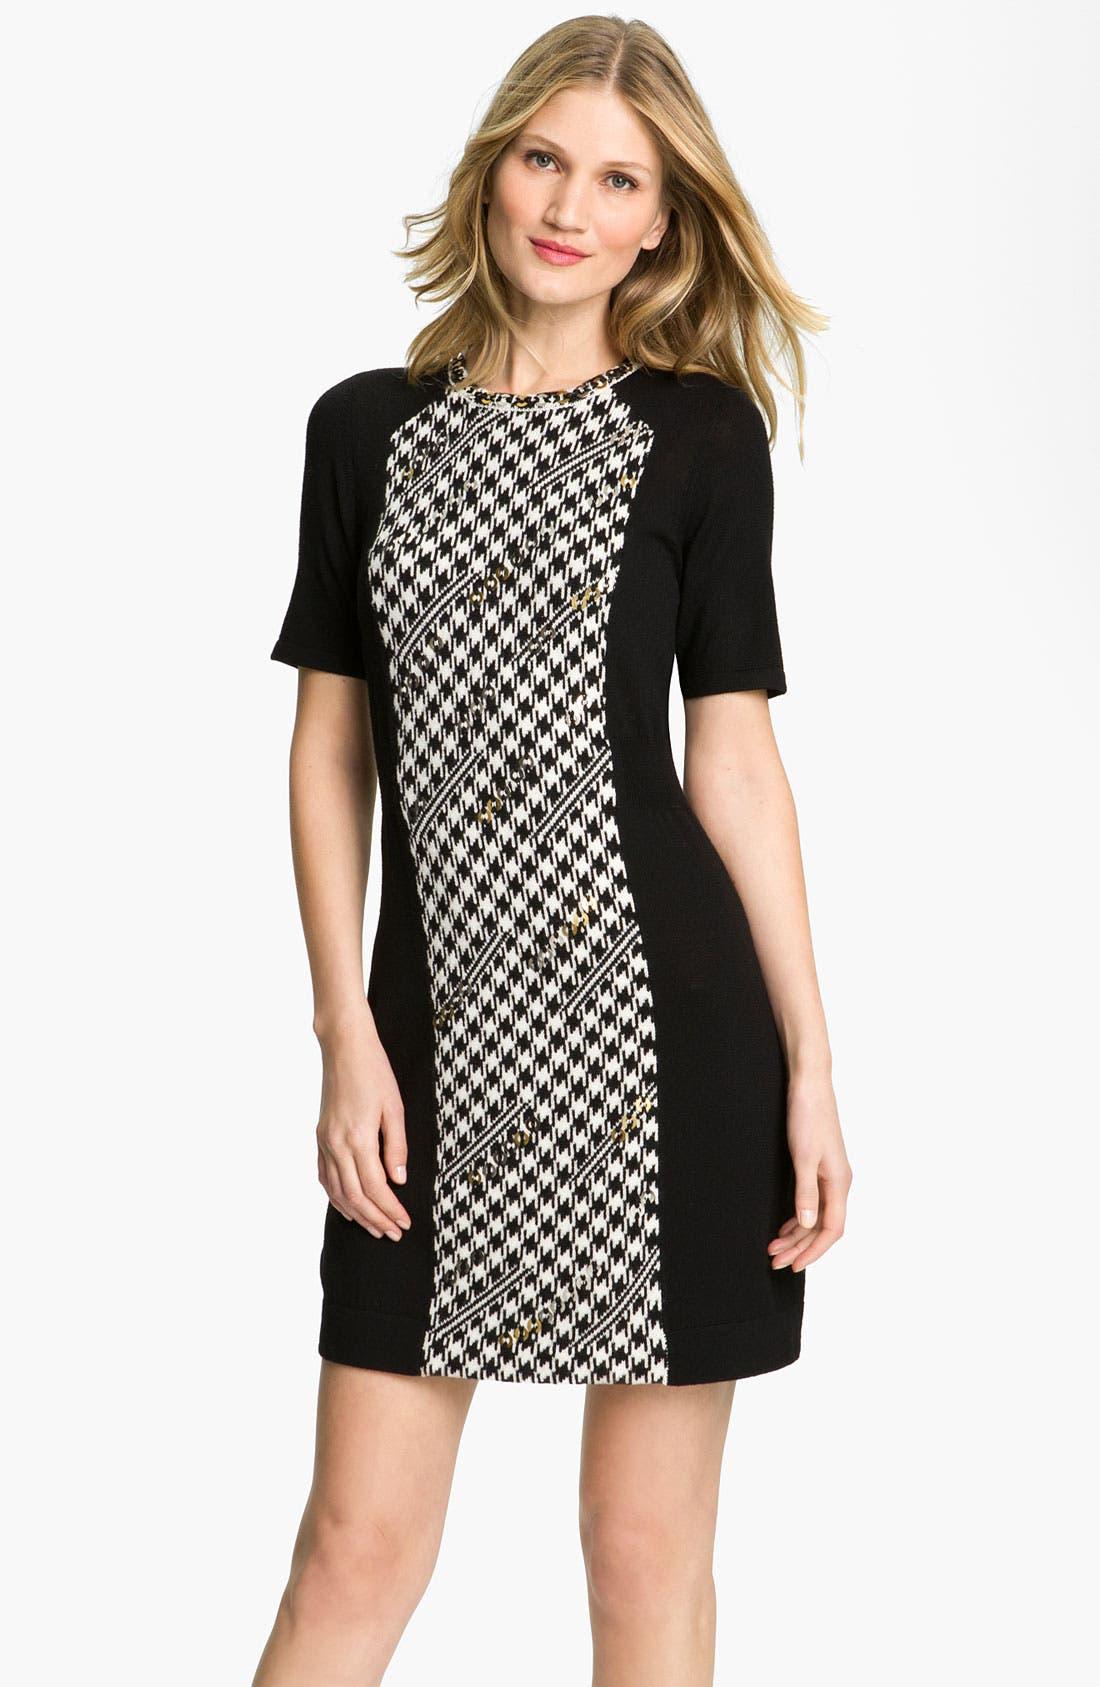 Main Image - Nanette Lepore 'Grand Prize' Merino Wool Sweater Dress